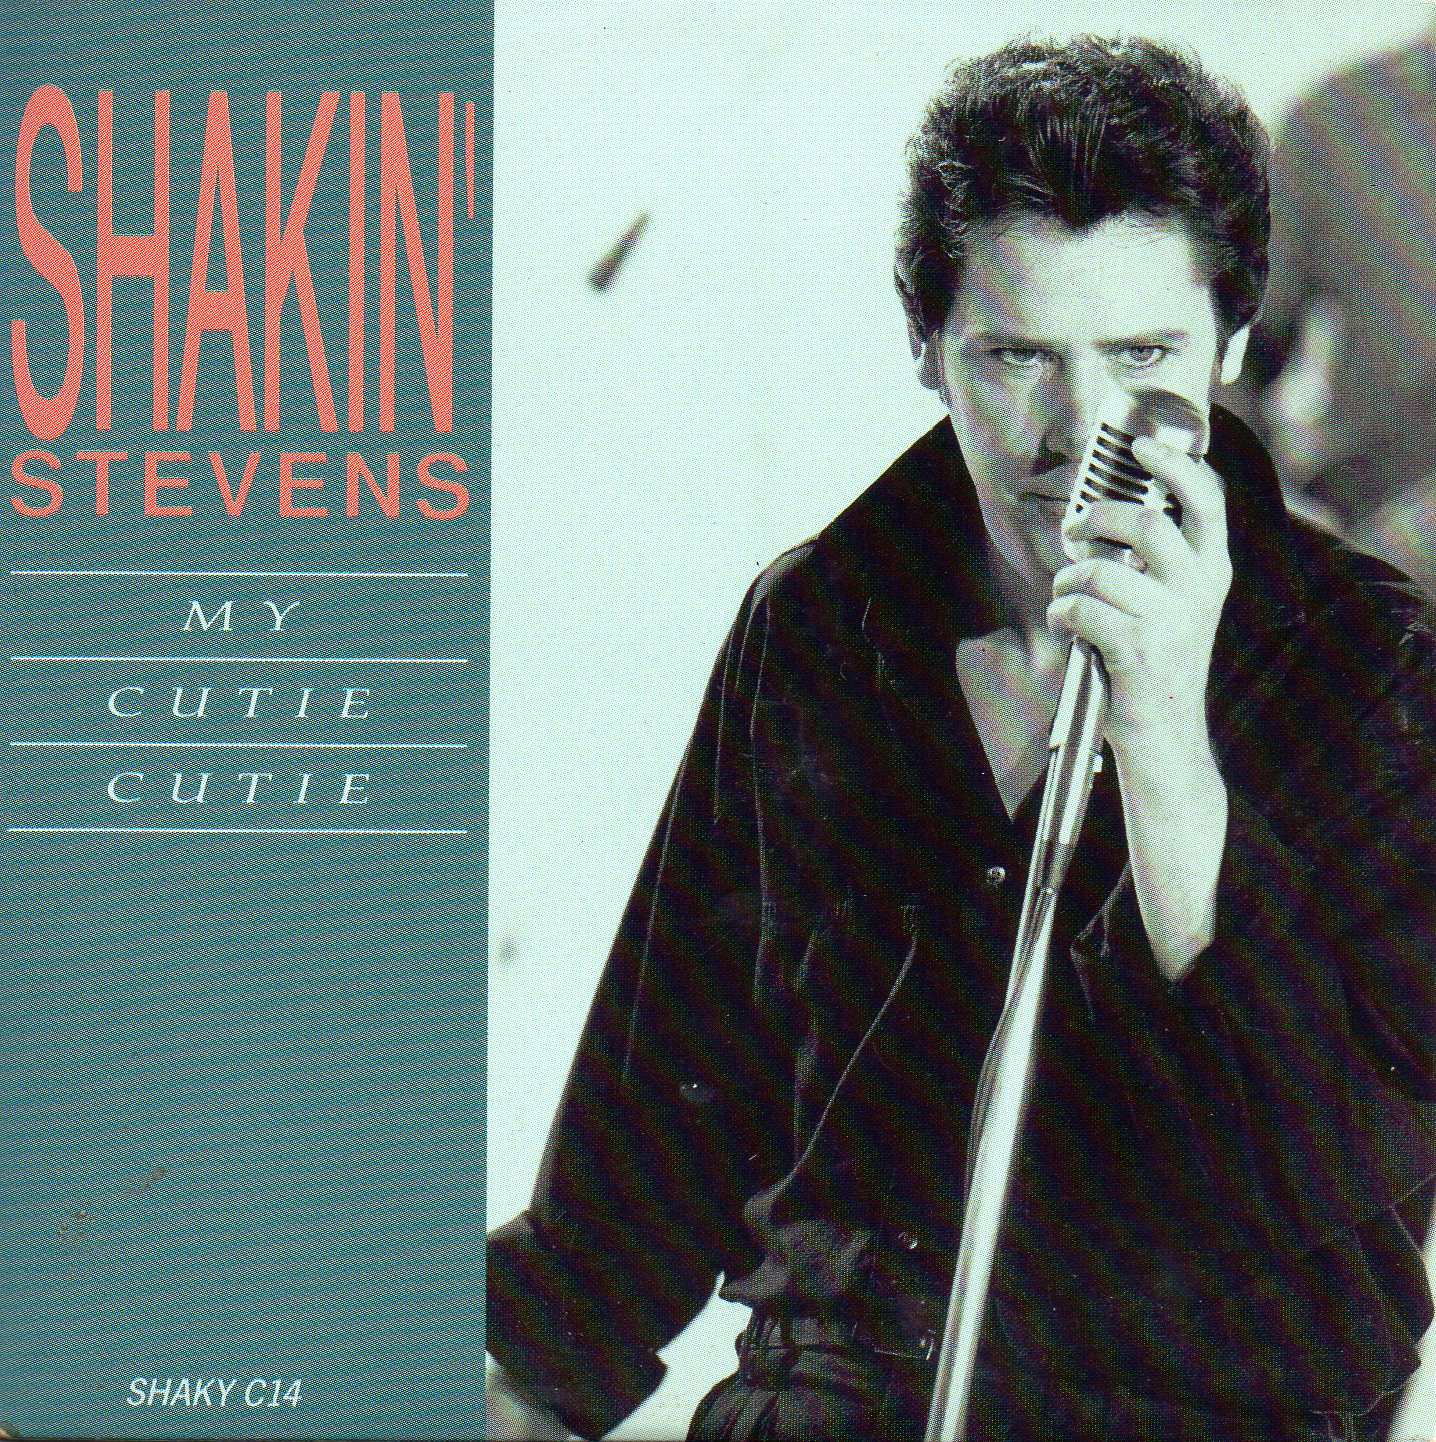 SHAKIN' STEVENS - My cutie cutie 2-track CARD SLEEVE - CD single